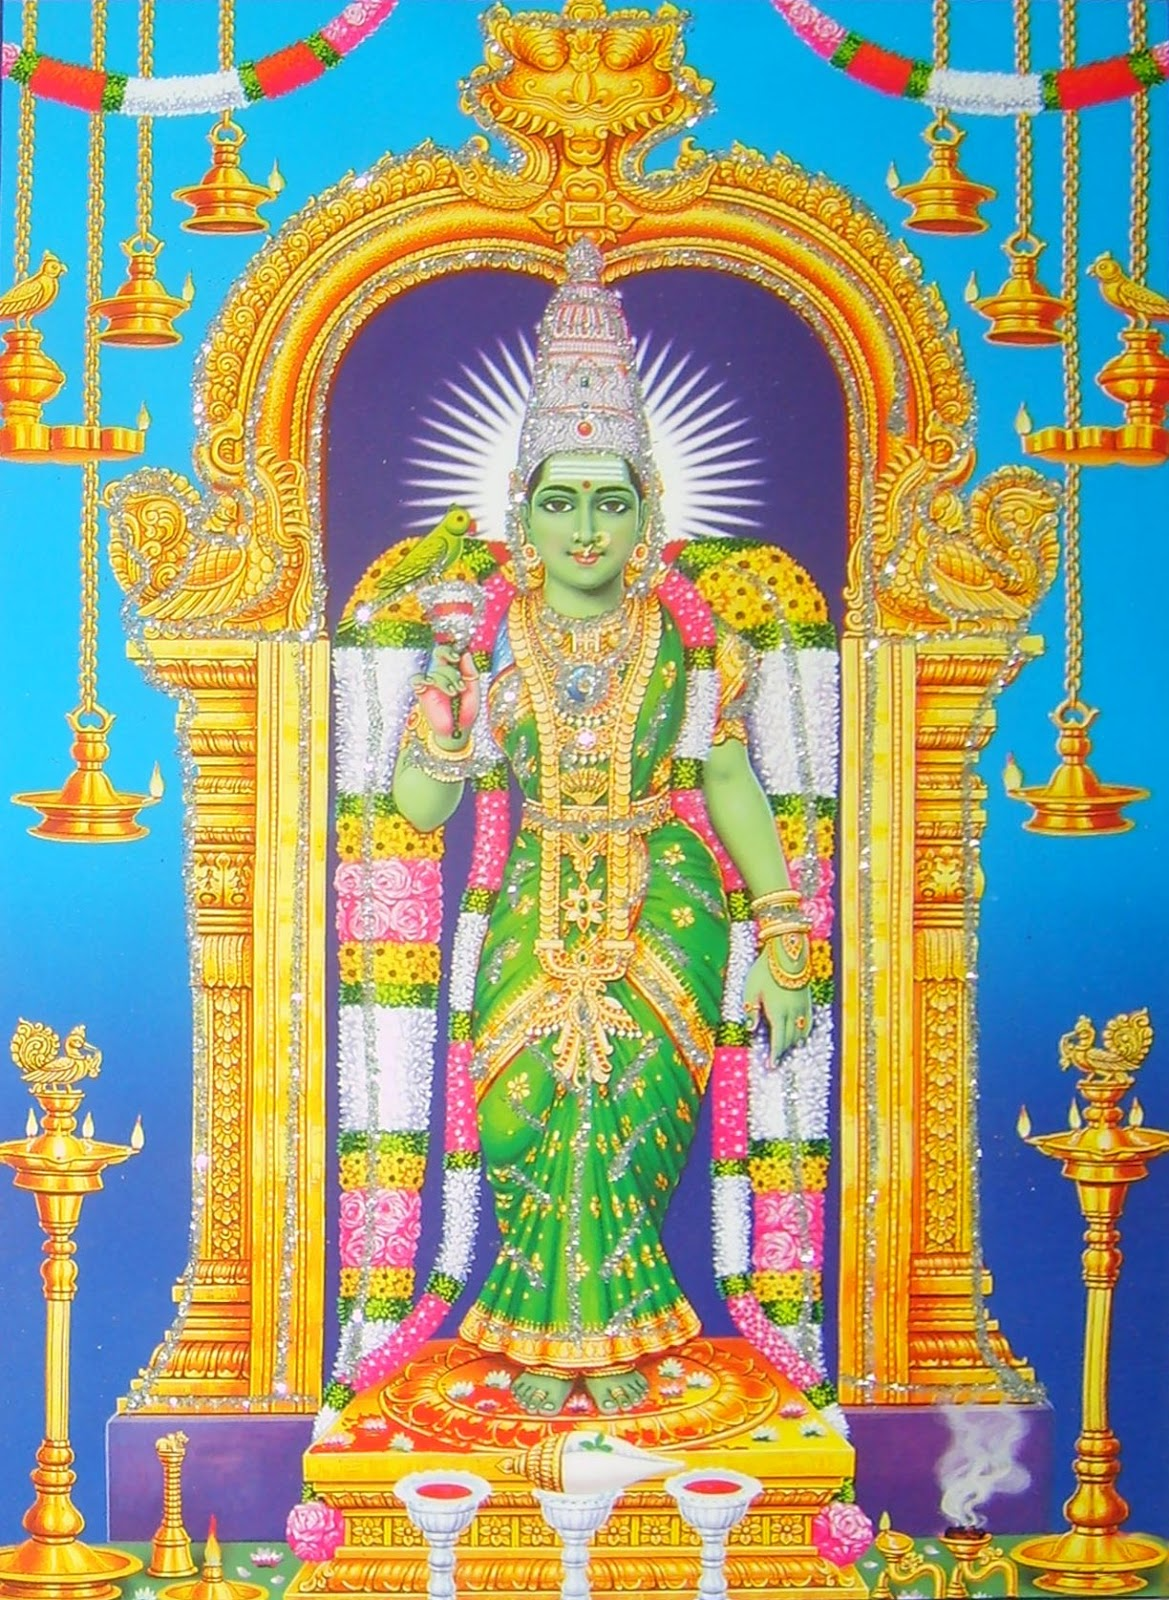 Meenakshi Temple - Wikipedia